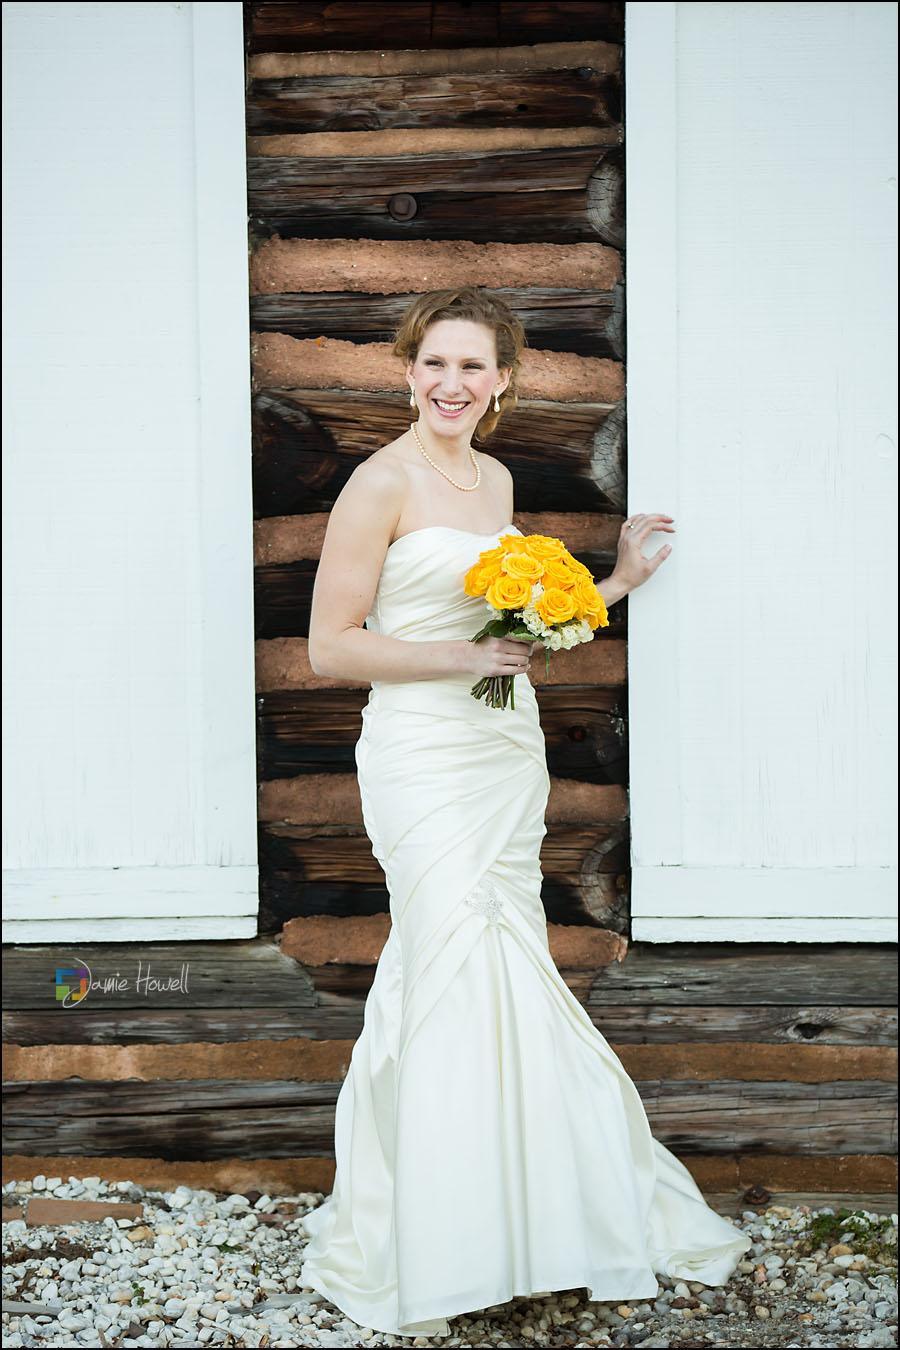 Nicole_Moody_Bridal-82